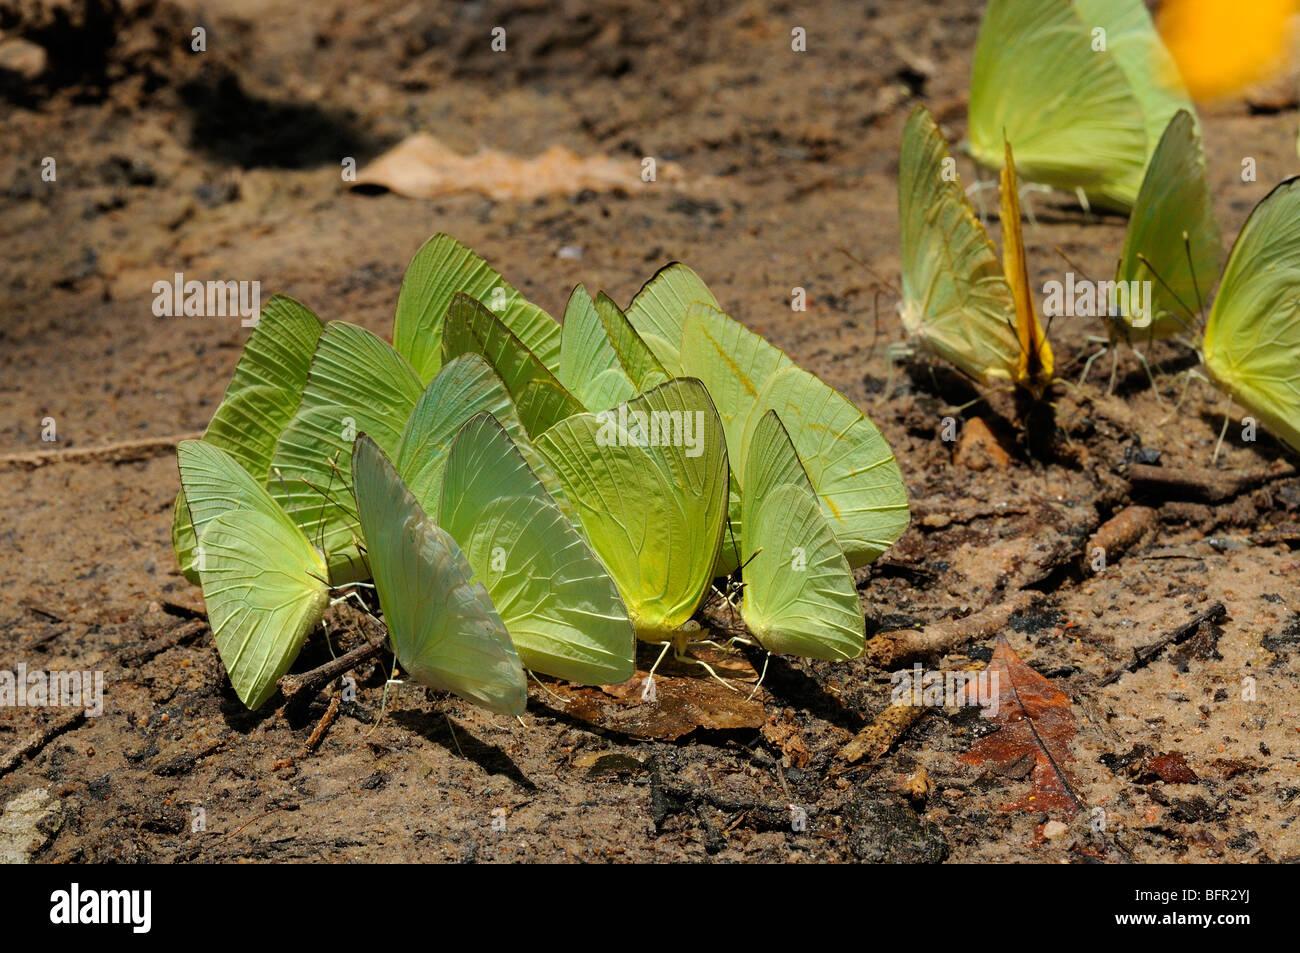 Sulphur Butterflies (Pierida/Colianidae) group feeding on sandy ground on minerals, Alta Floresta, Brazil. - Stock Image